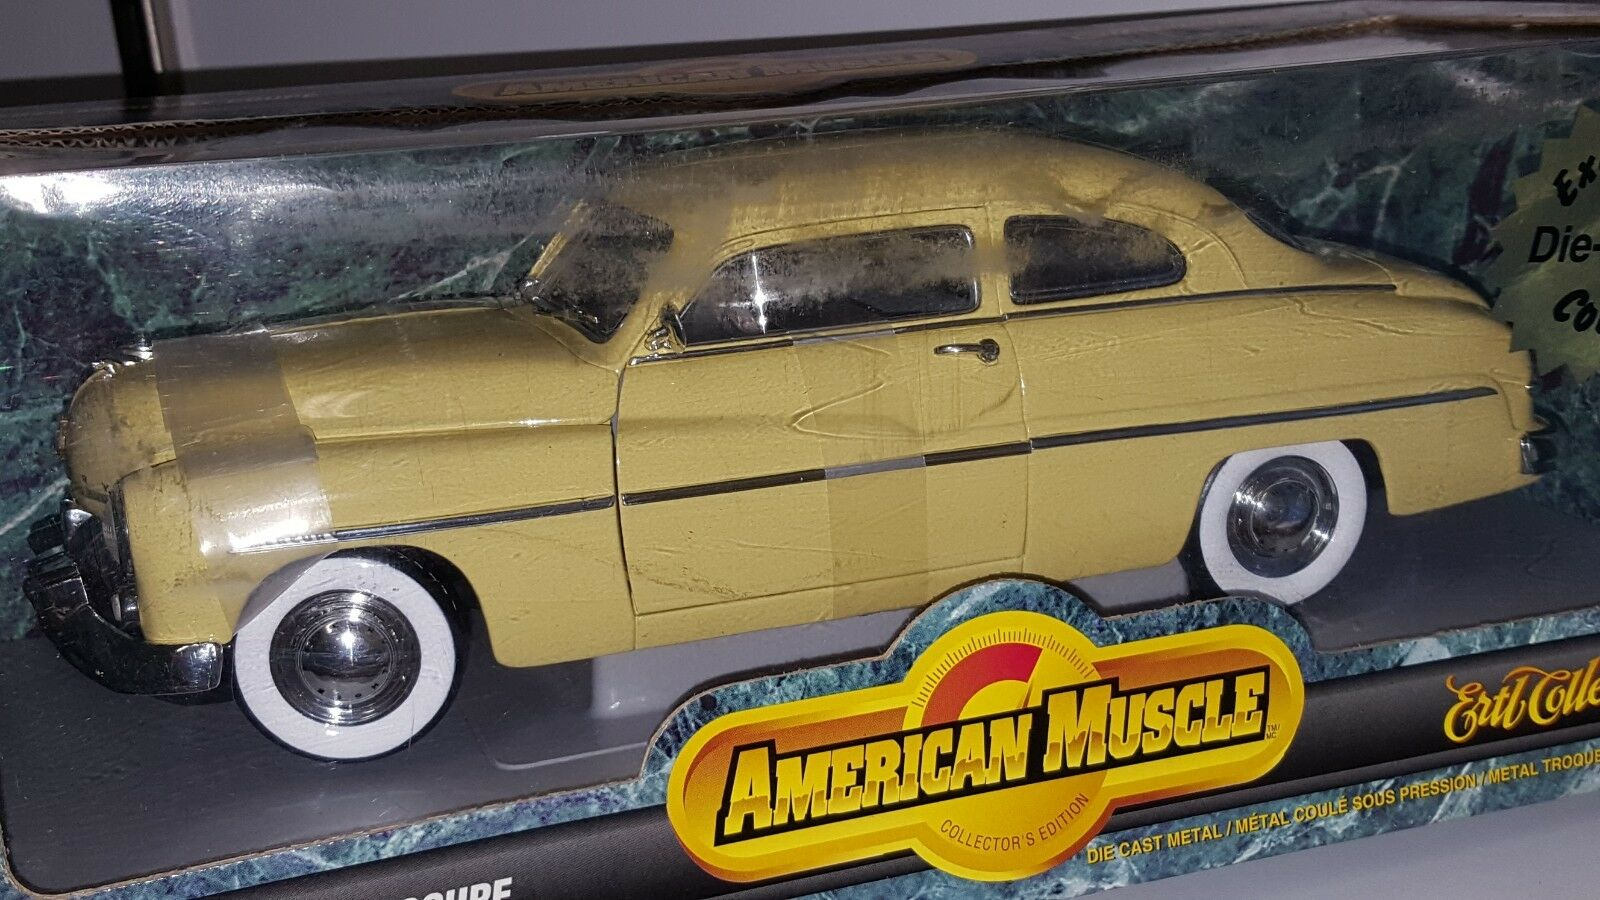 Venta en línea de descuento de fábrica 1 18 Ertl American Muscle Muscle Muscle 1949 Mercury Coupe Luz Amarilla GD  en linea